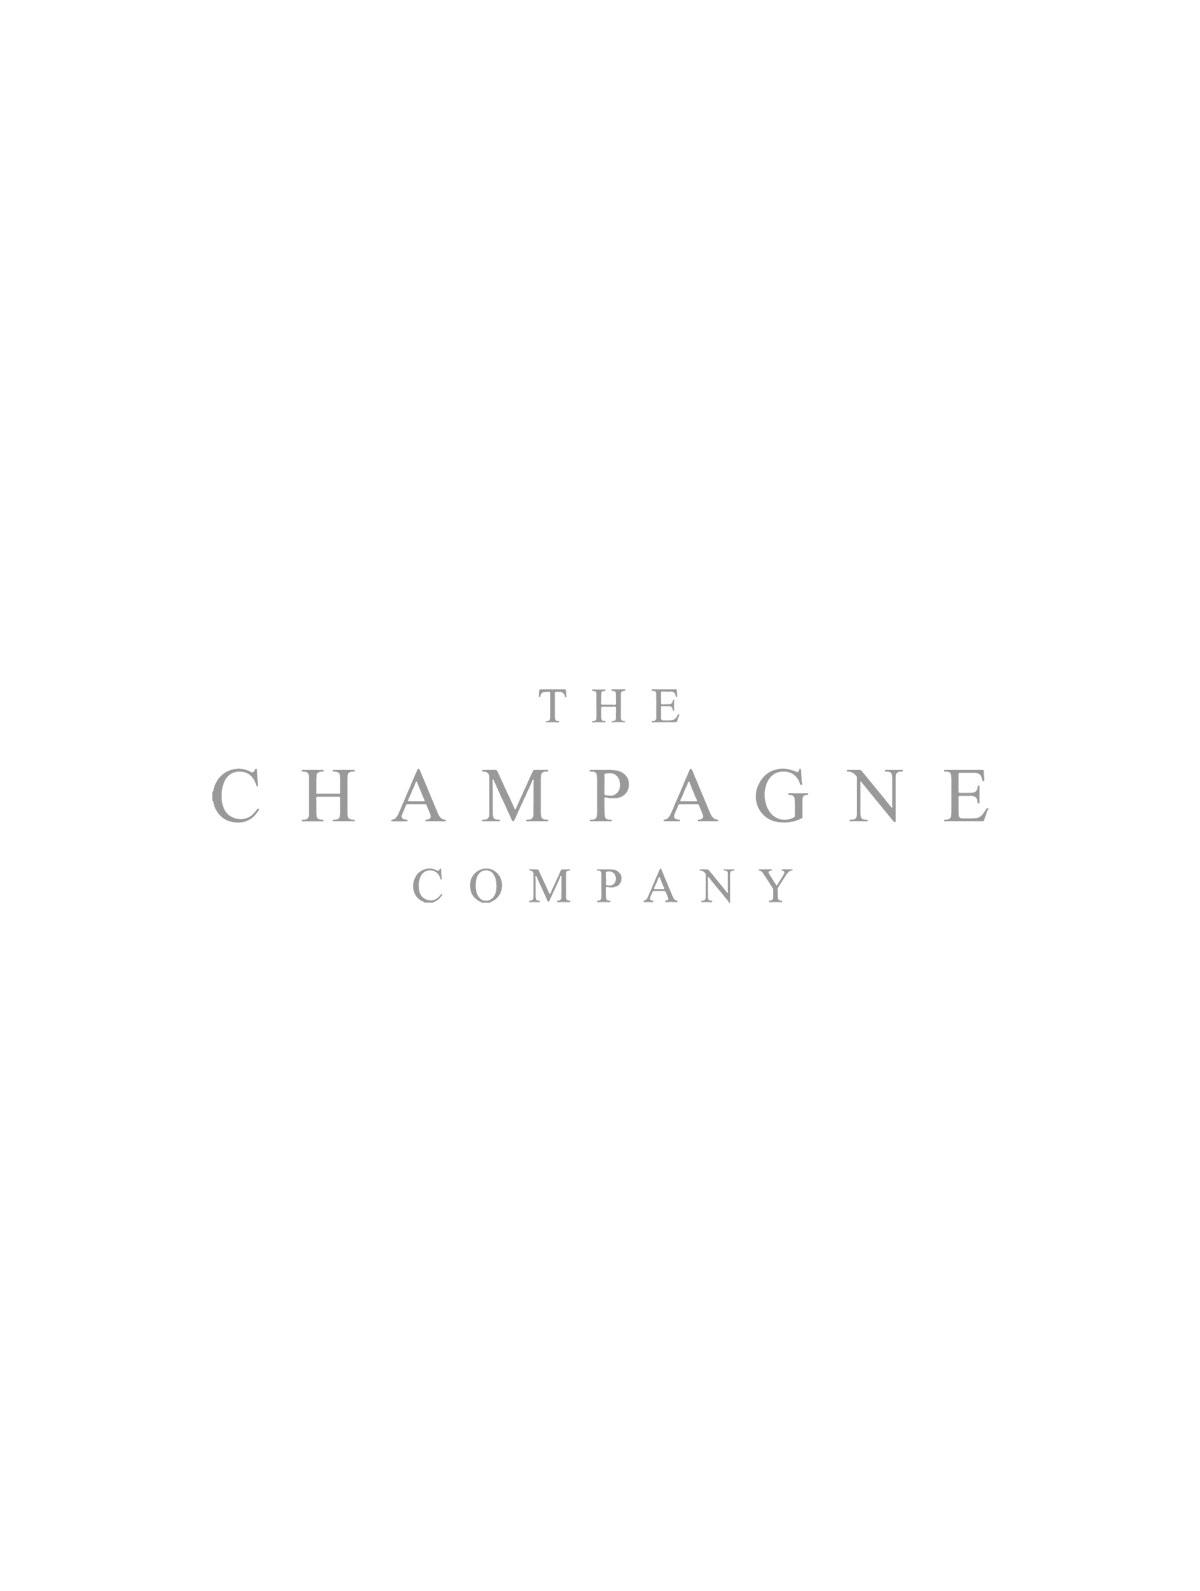 Herdade do Esporao Private Selection Branco 2014 Portuguese Wine 75cl